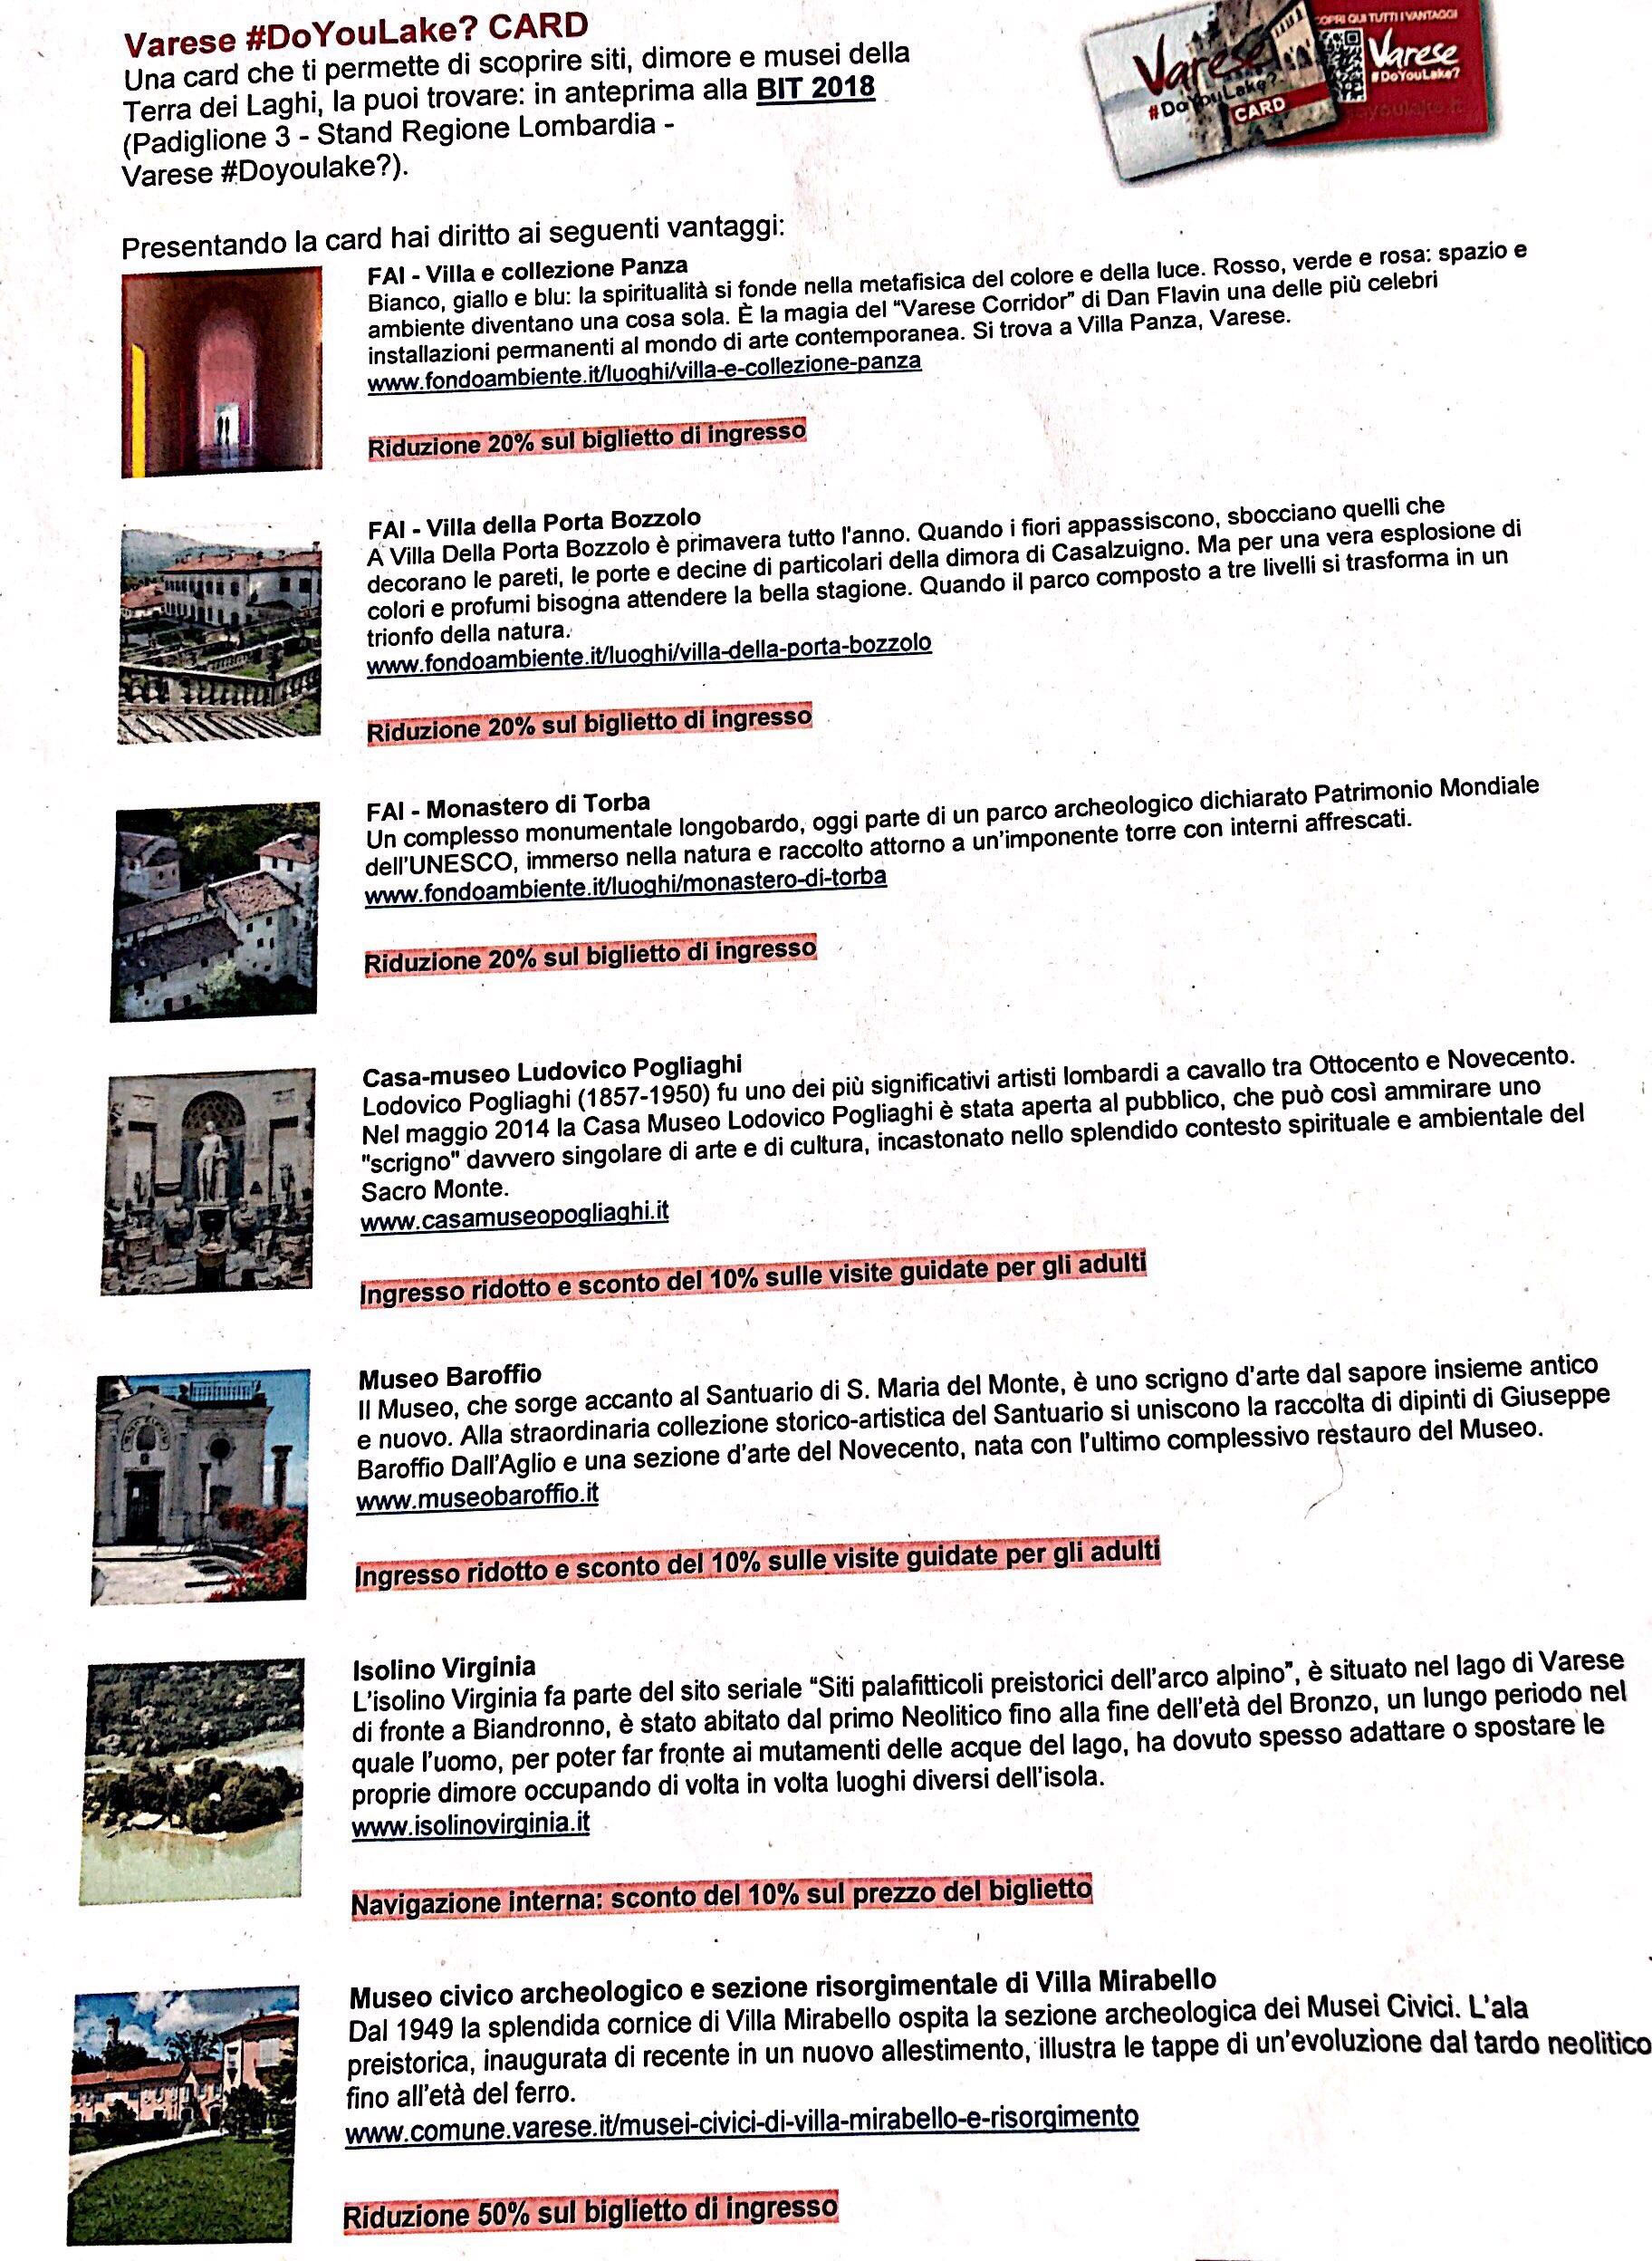 Varese doyoulake card lista sconti e promozioni